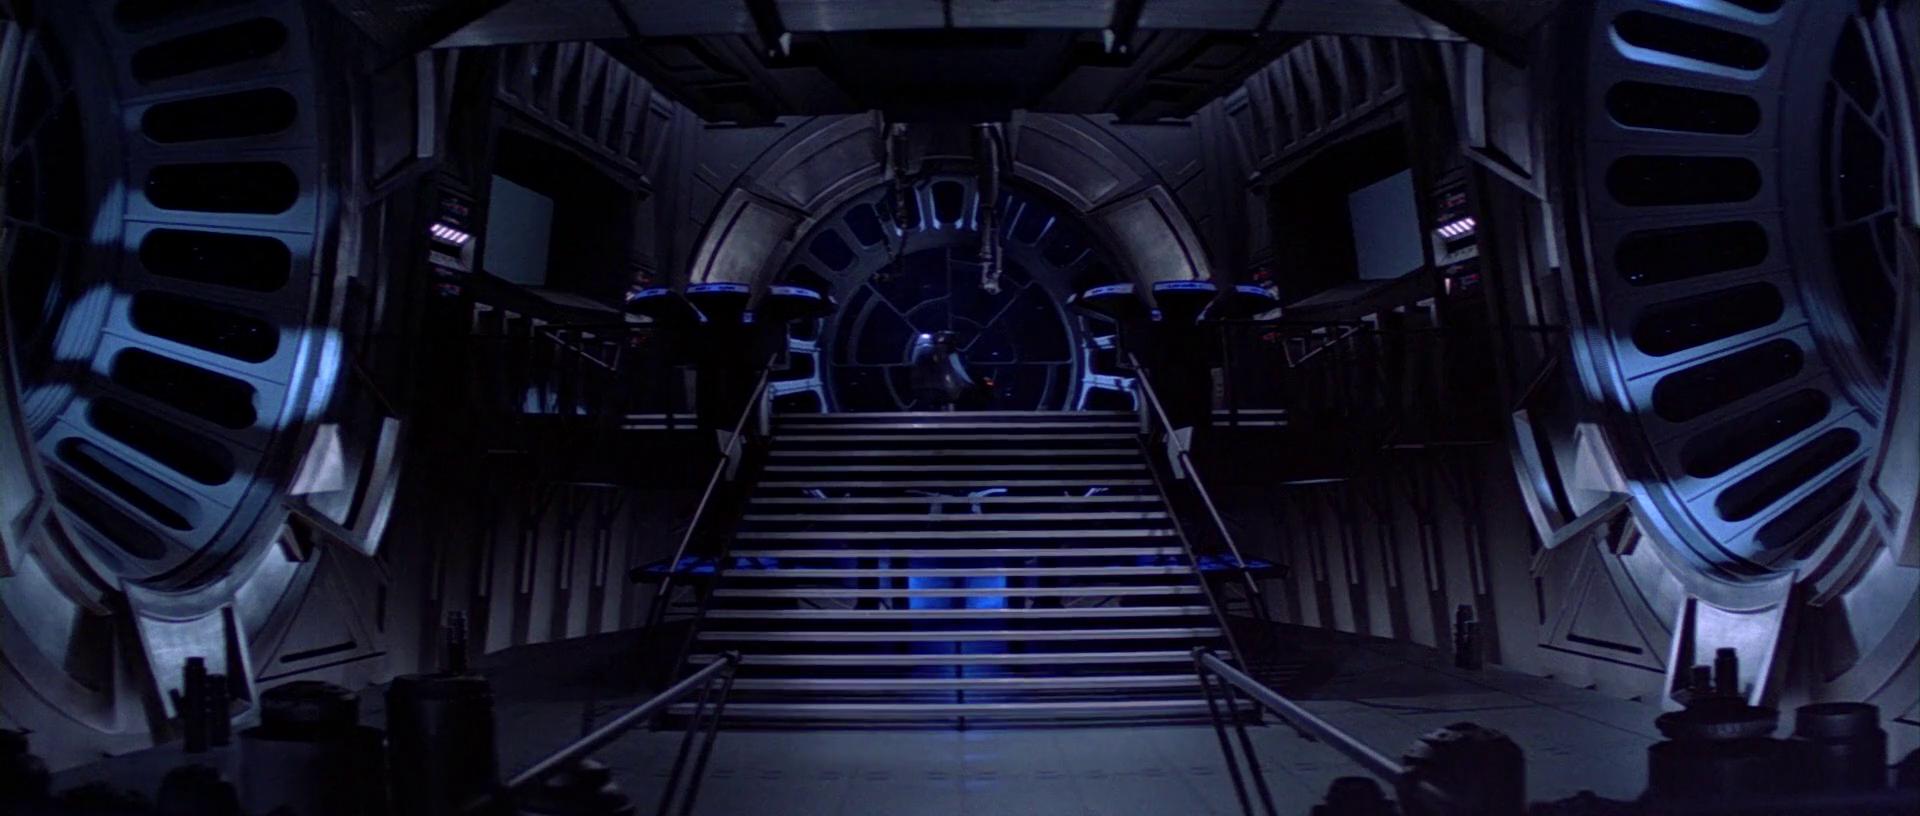 Parallels Between Episodes Screenshots The Cantina